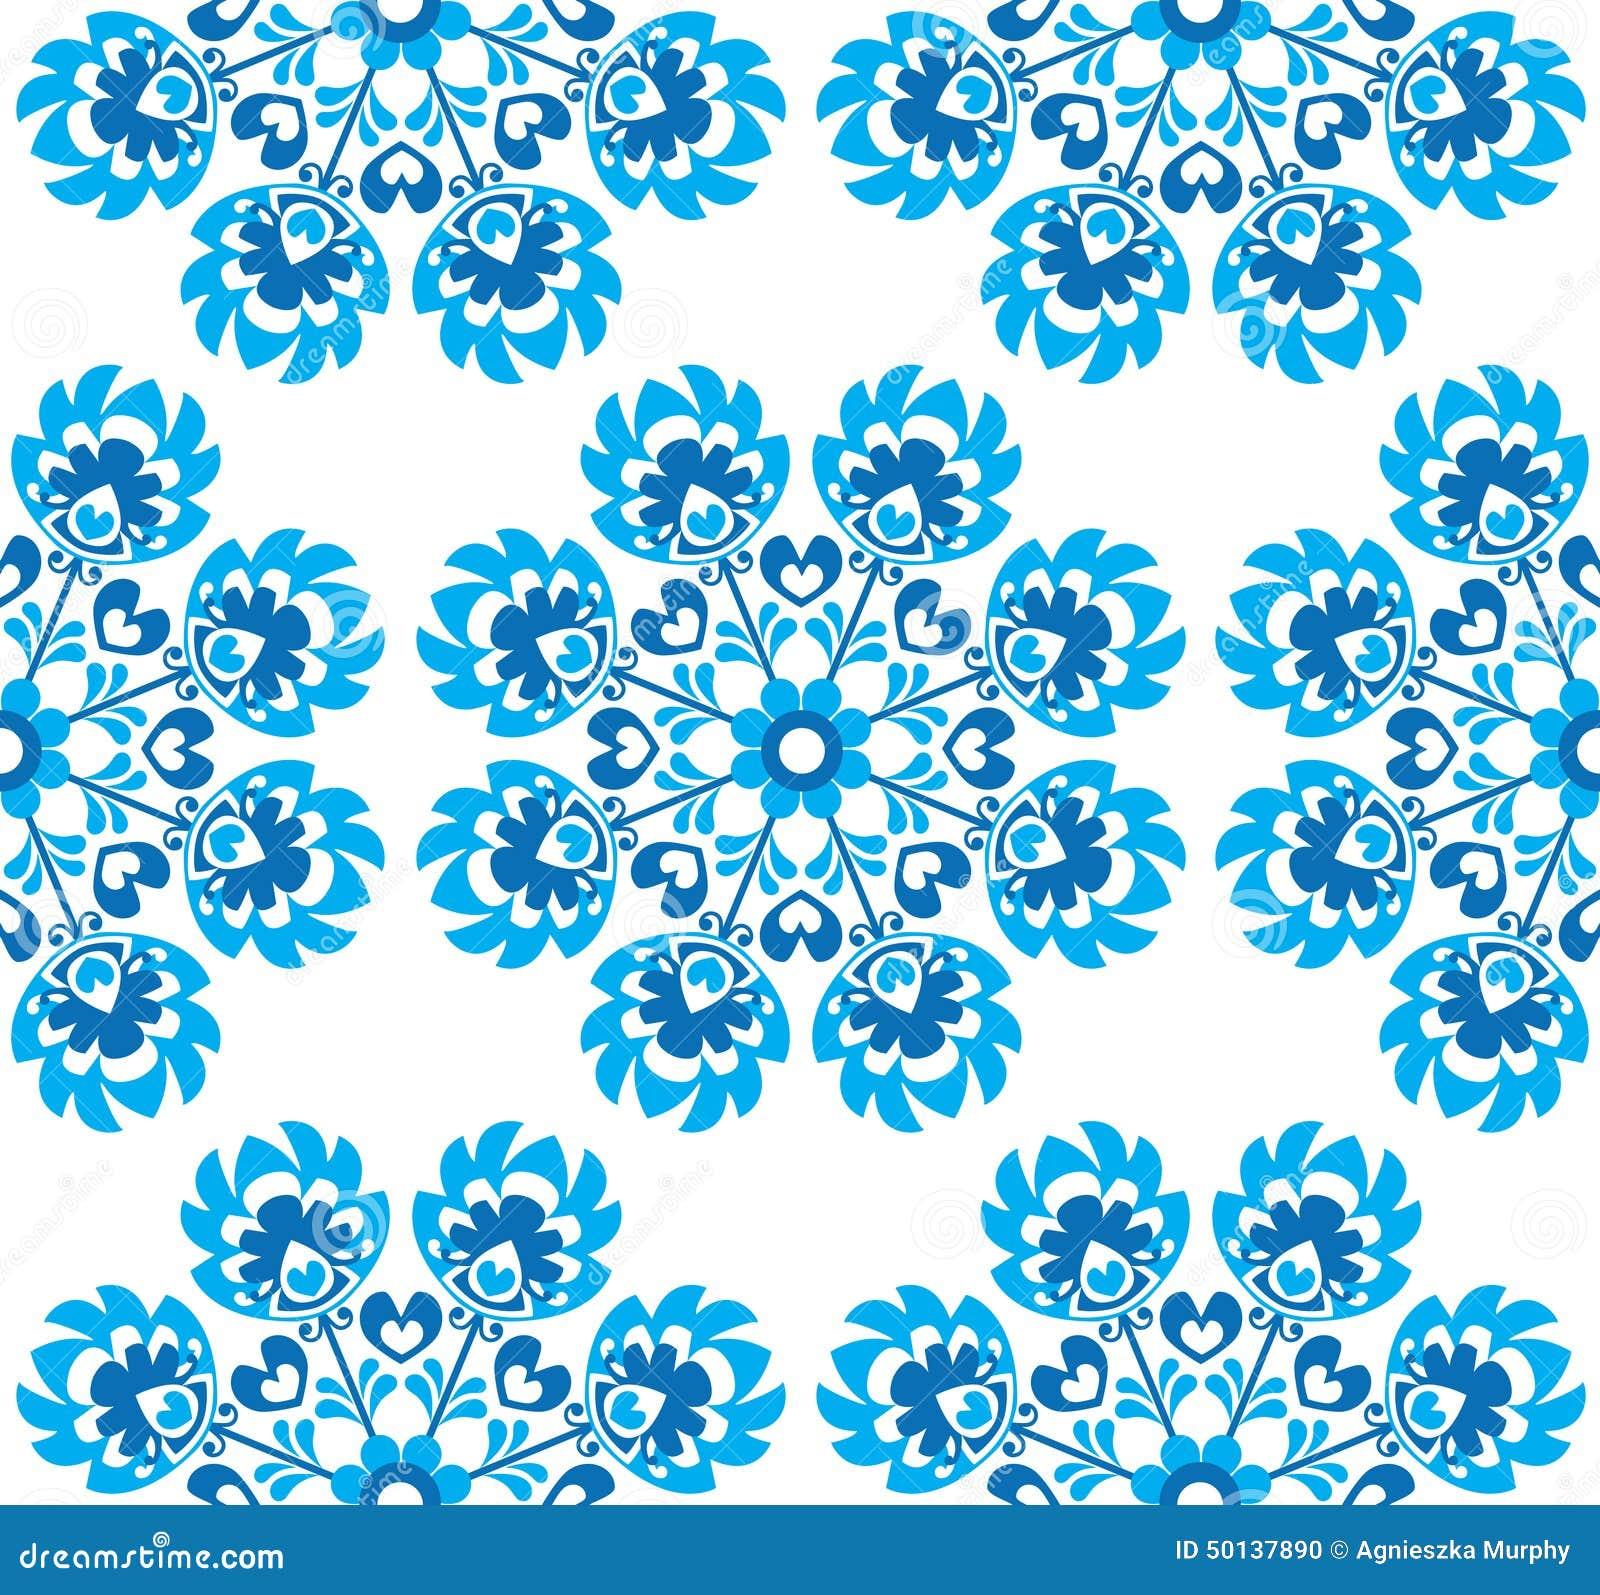 Nahtloses blaues polnisches Volkskunstmit blumenmuster - wzory lowickie, wycinanki